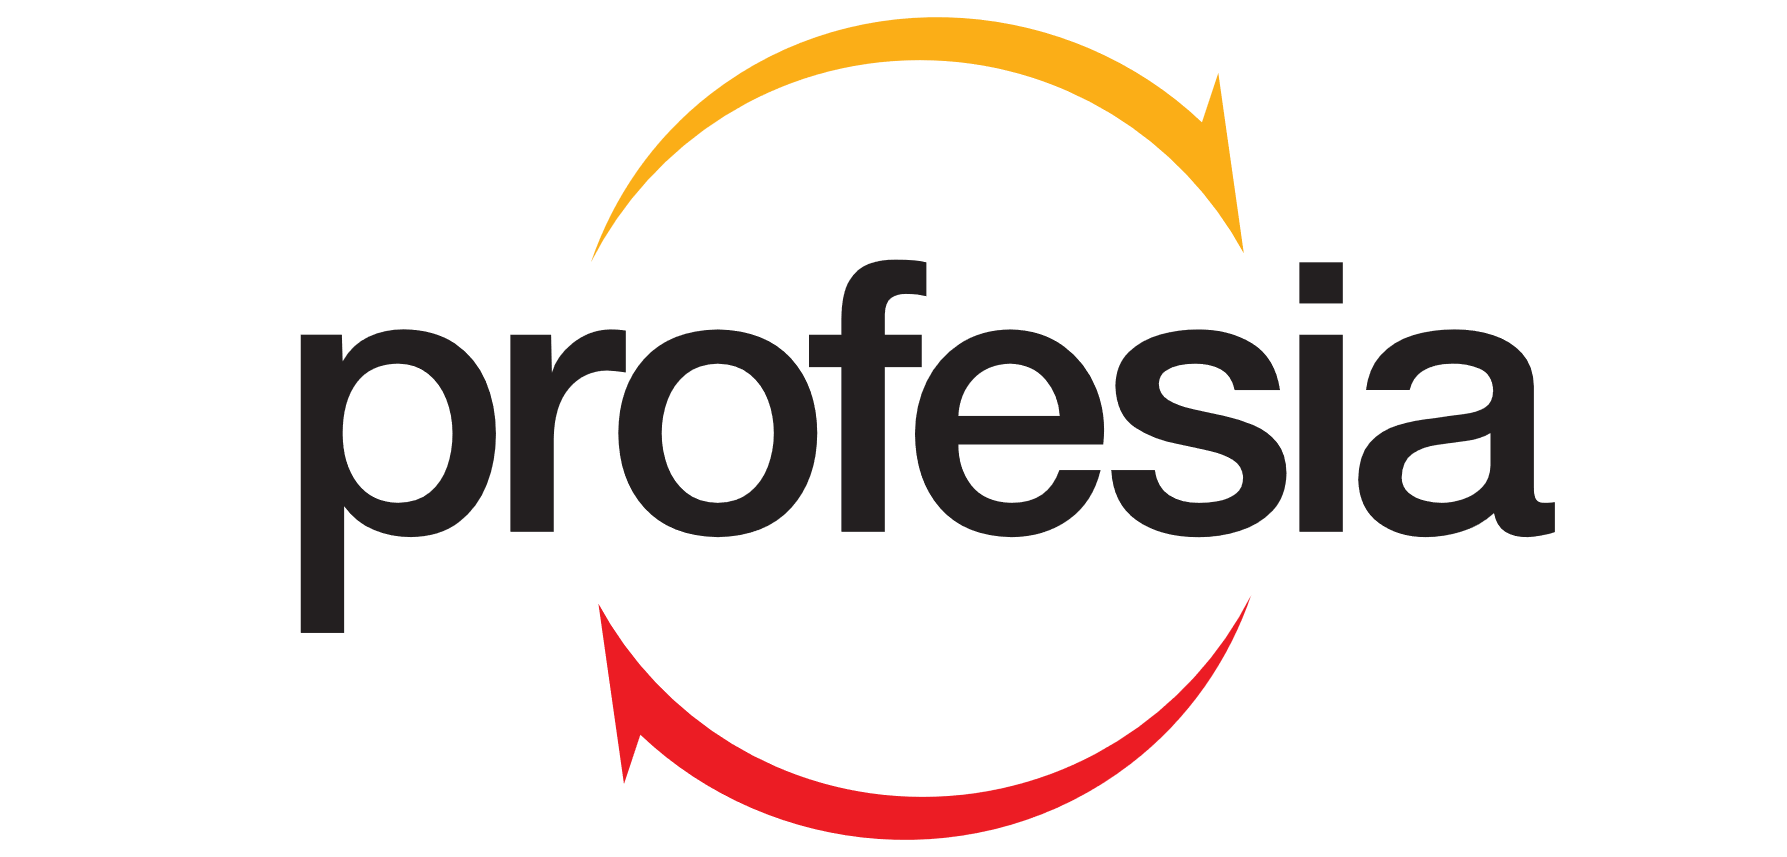 http://motivp.com/content/images/profesia_logo.png